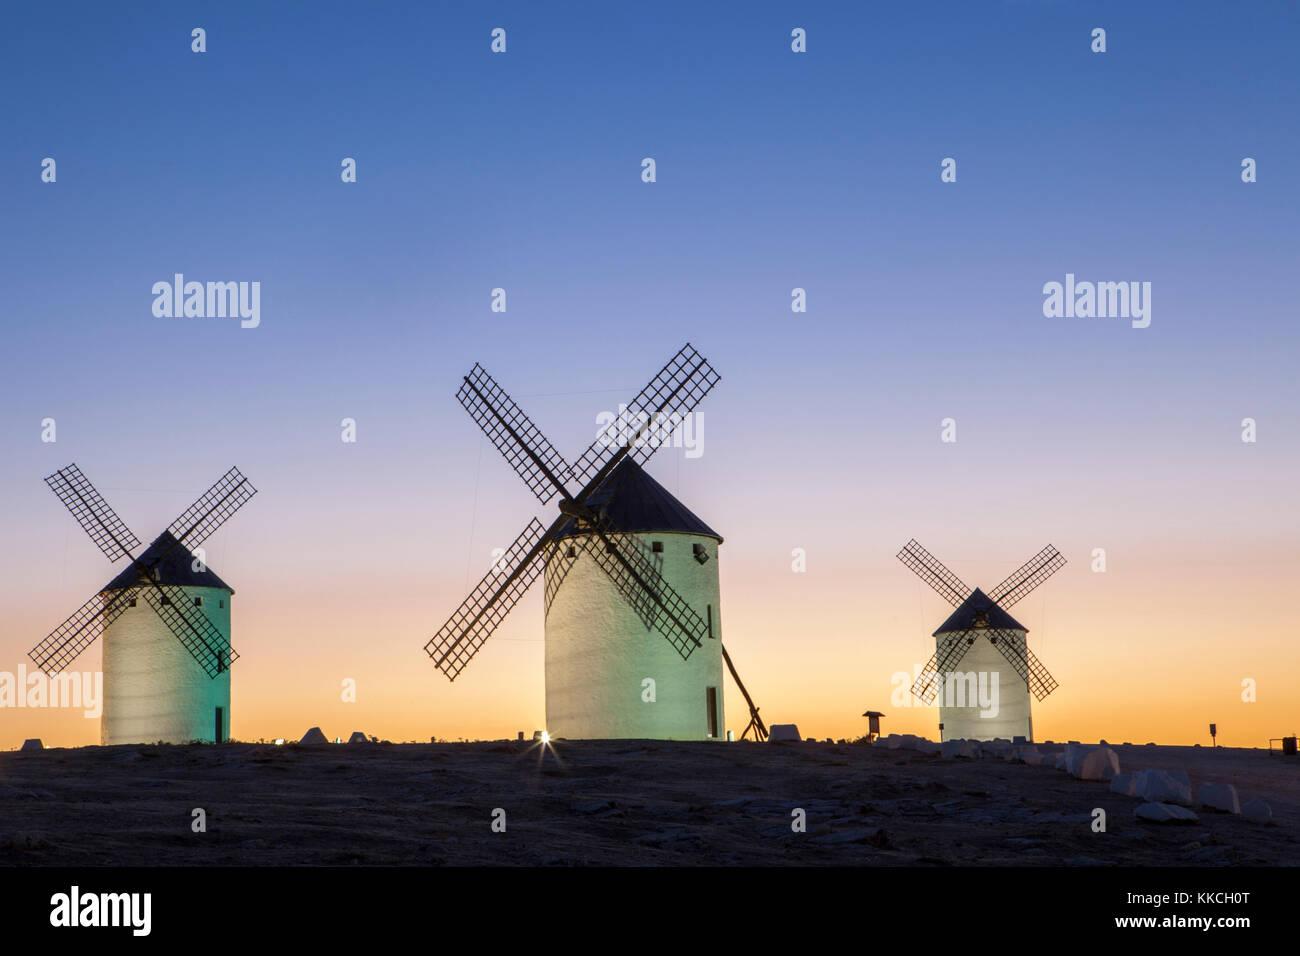 Illuminaed traditional windmills at rising, Campo de Criptana, Spain - Stock Image